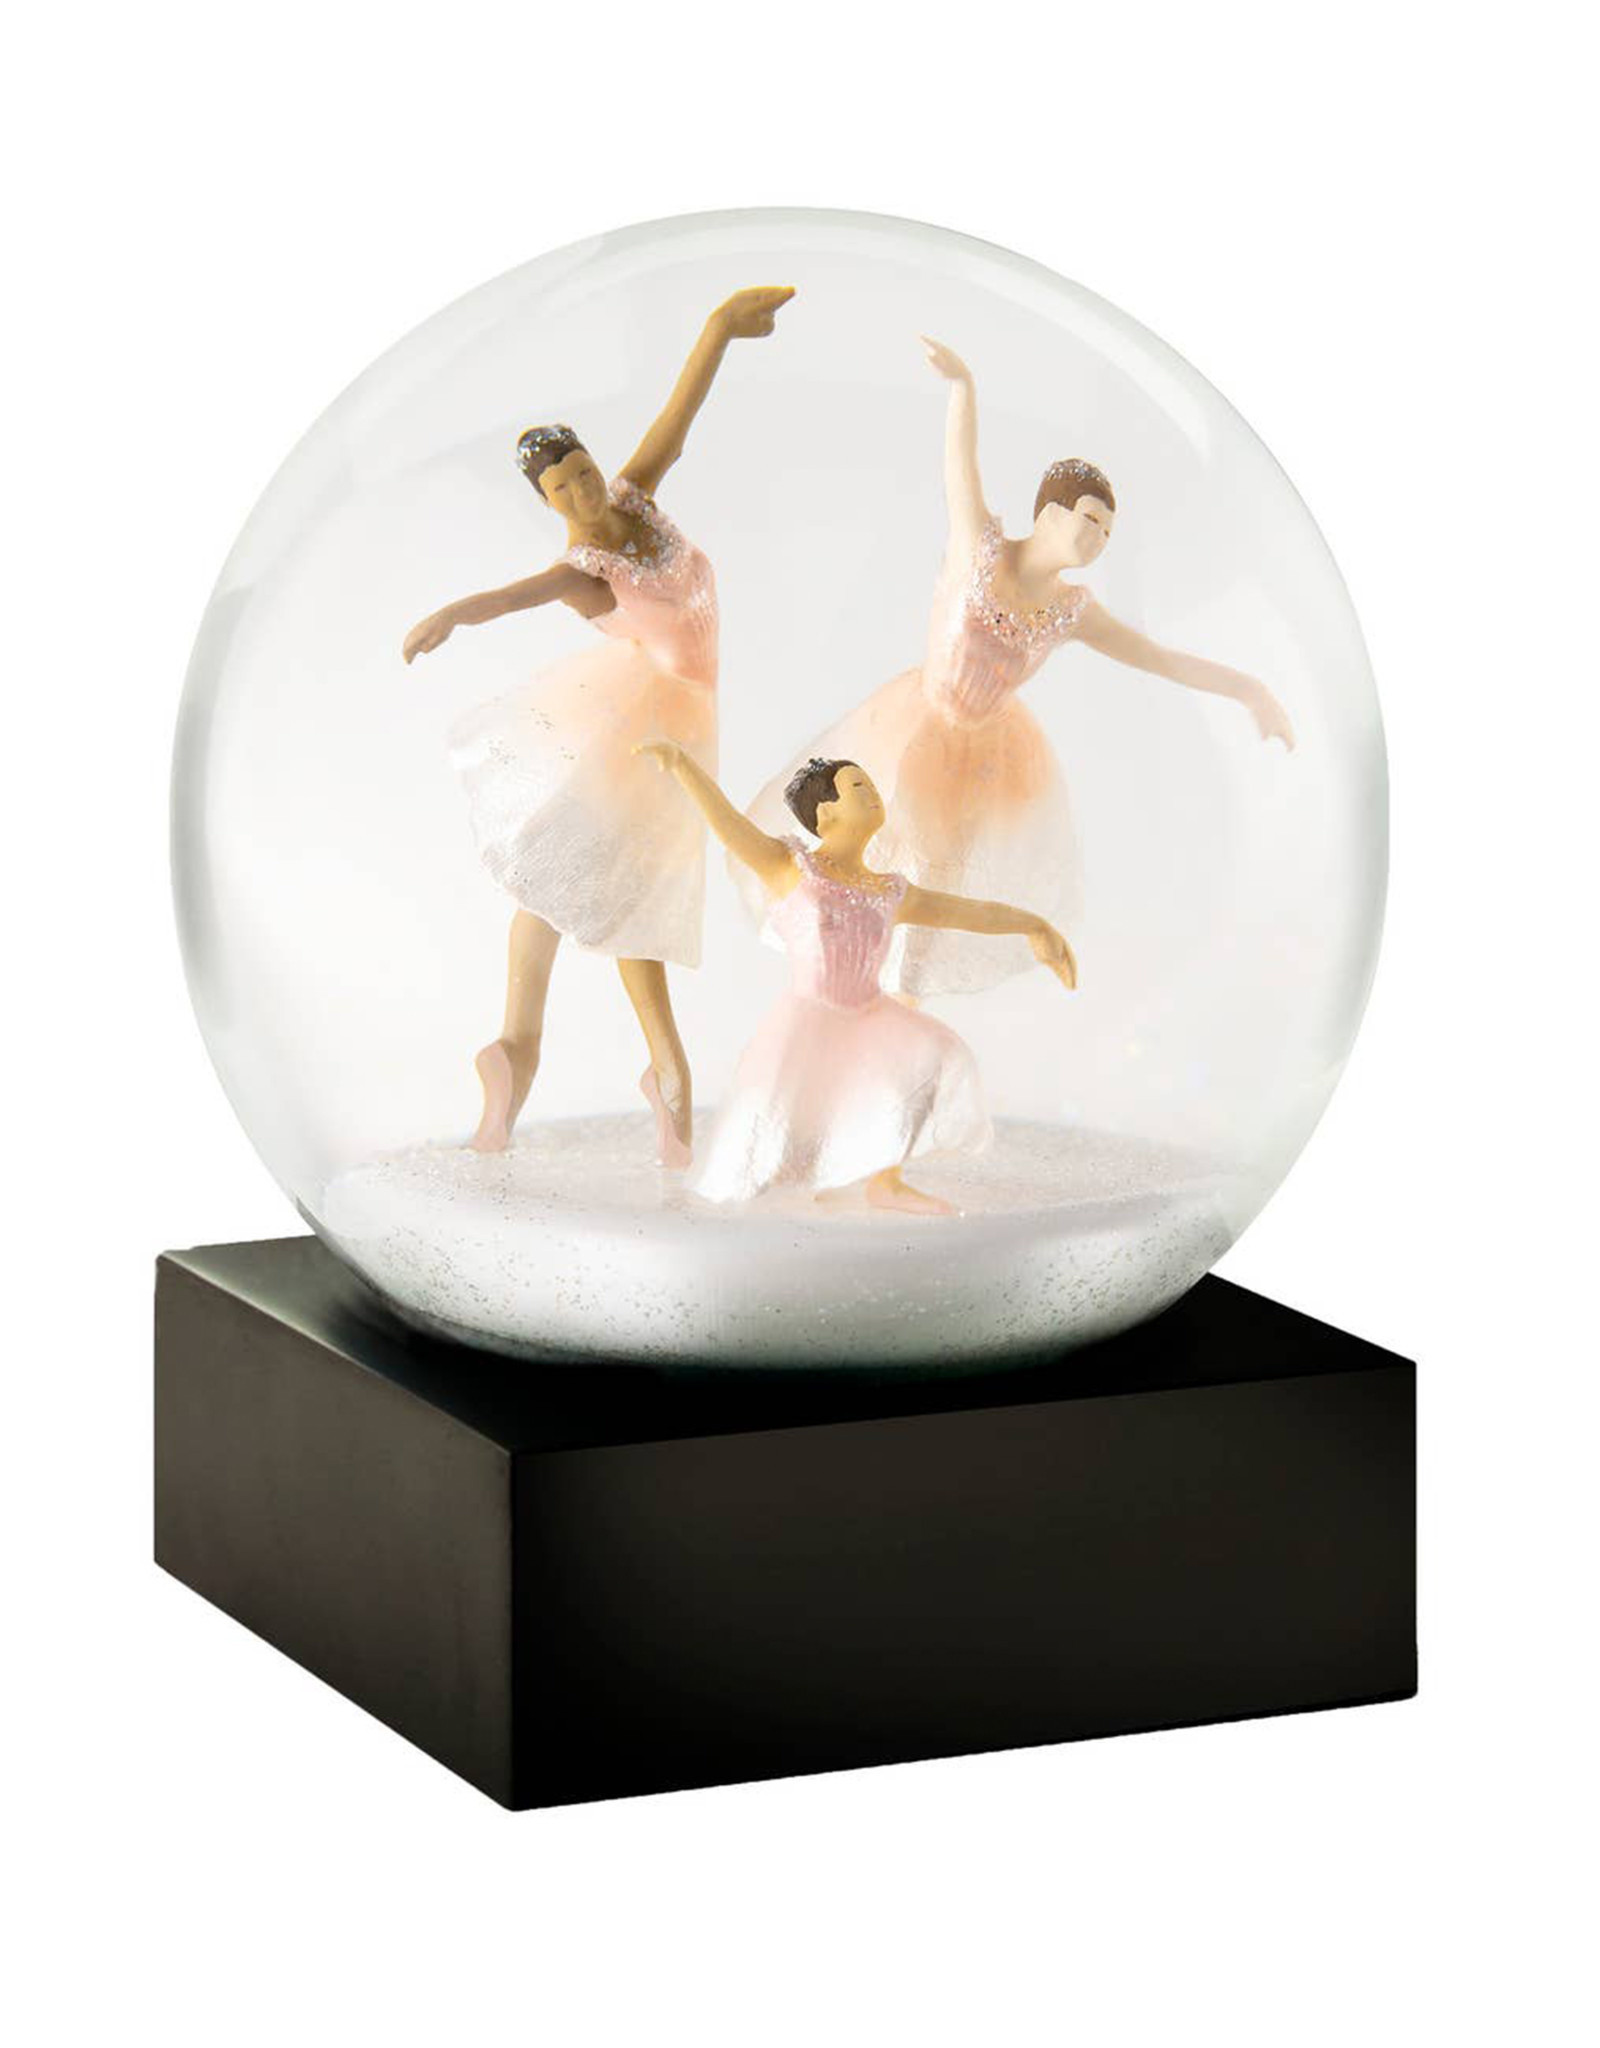 COOL SNOW GLOBES THREE DANCERS SNOWGLOBE